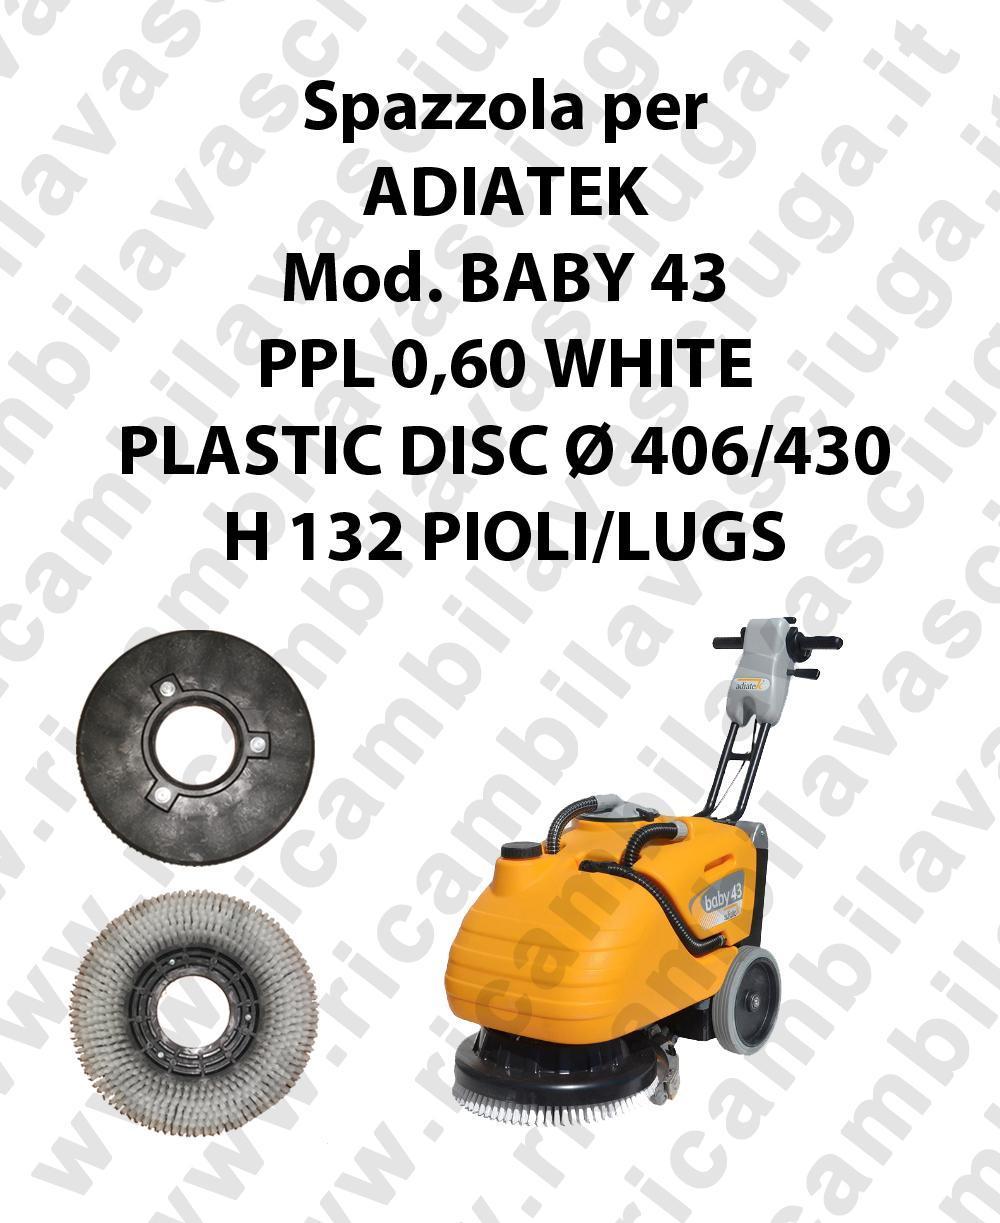 BROSSE A LAVER PPL 0,60 WHITE pour autolaveuses ADIATEK Reference BABY 43